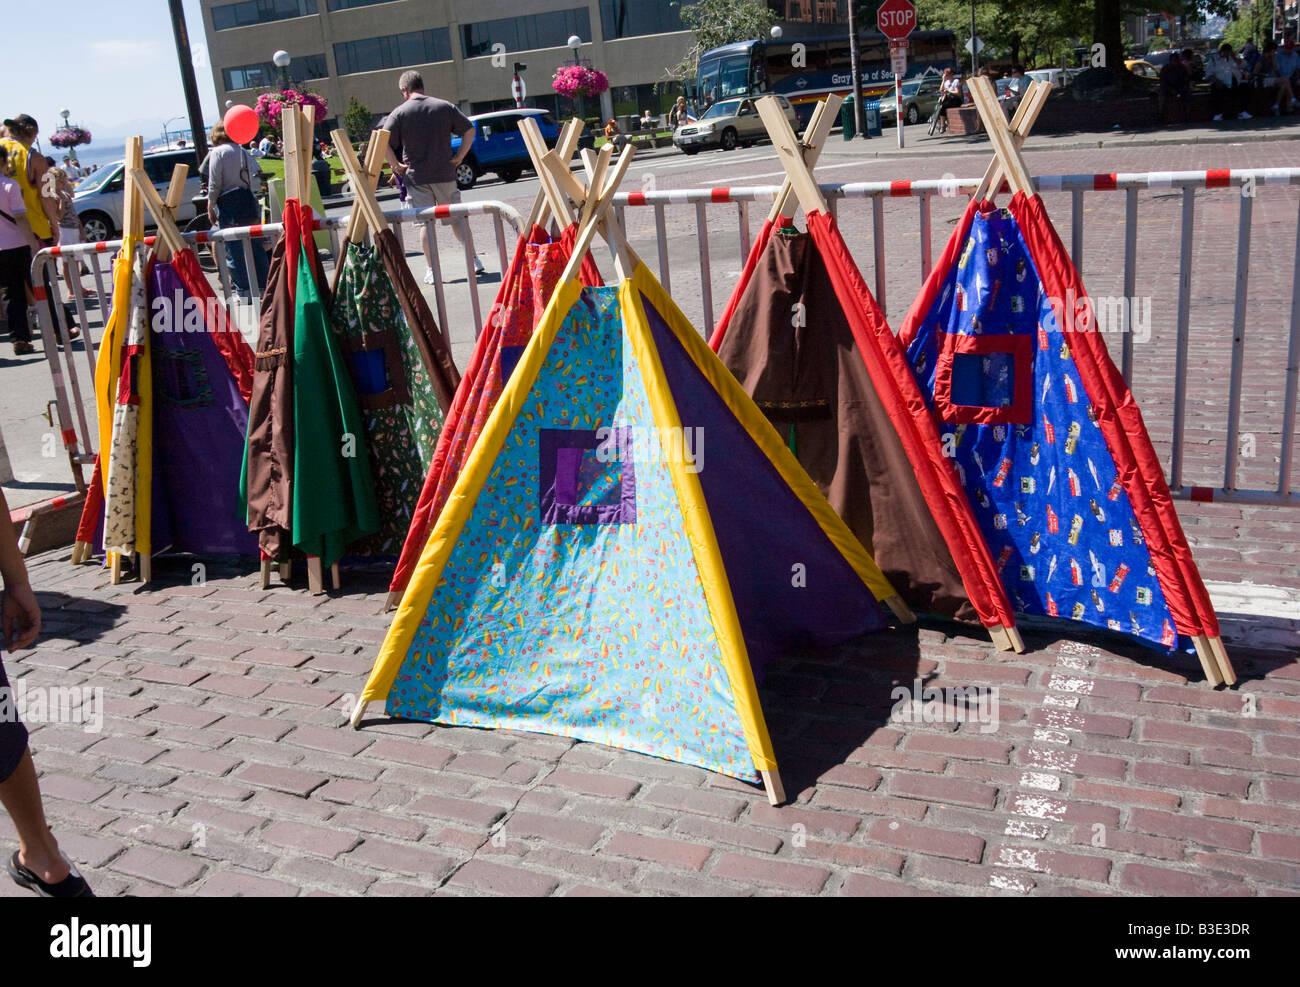 Childrenu0027s wigwam tents for sale Pike Place Farmers Market Seattle Washington State WA USA & Childrenu0027s wigwam tents for sale Pike Place Farmers Market Seattle ...